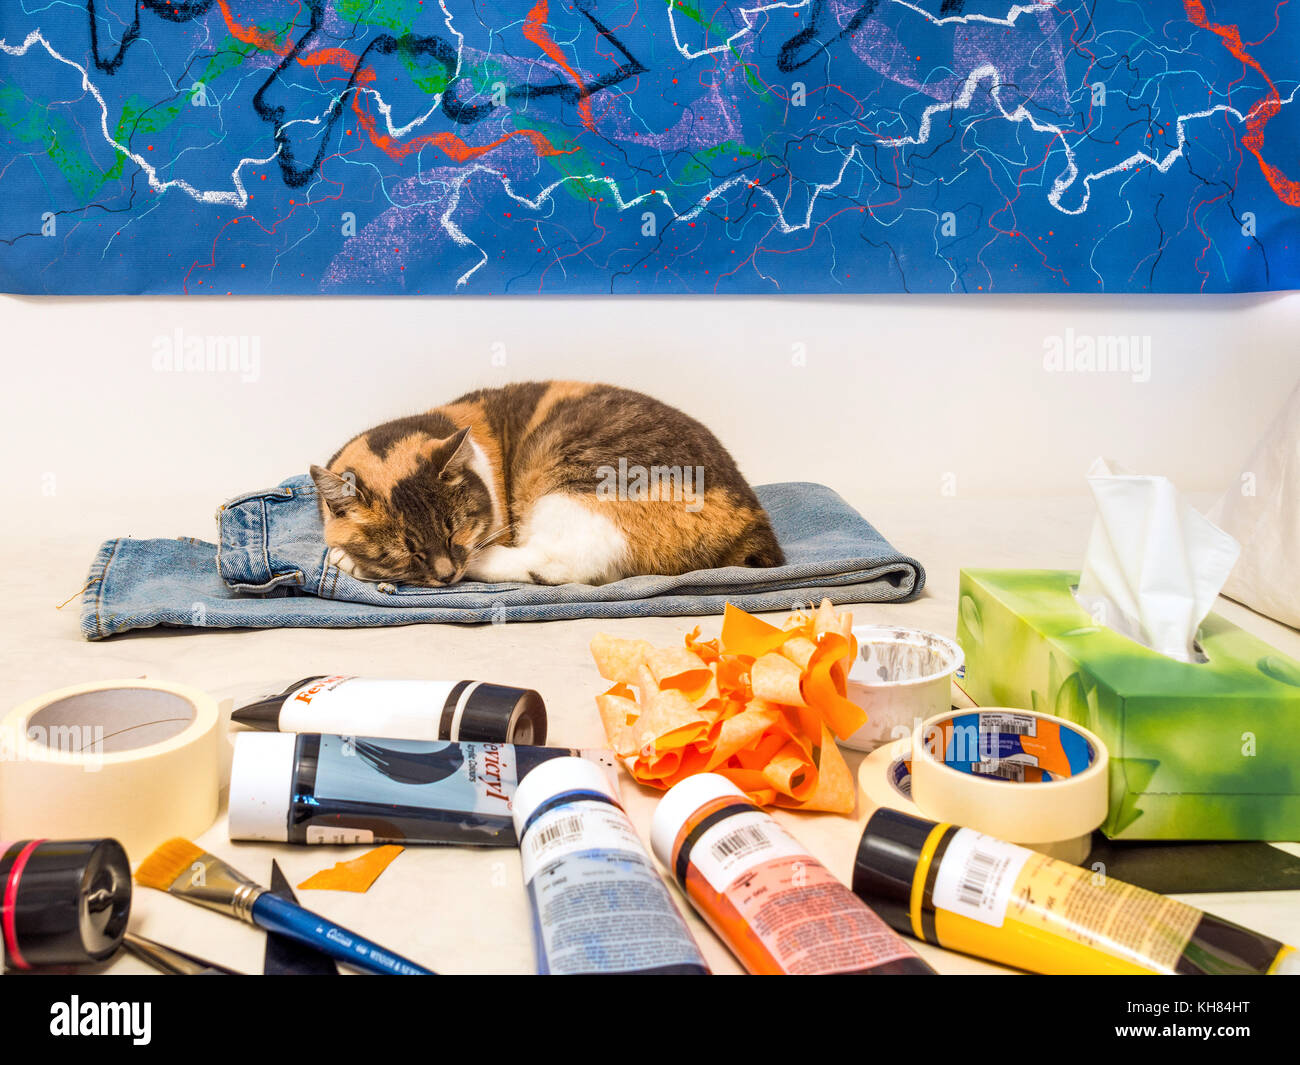 Sleeping cat in artist's studio - France. - Stock Image